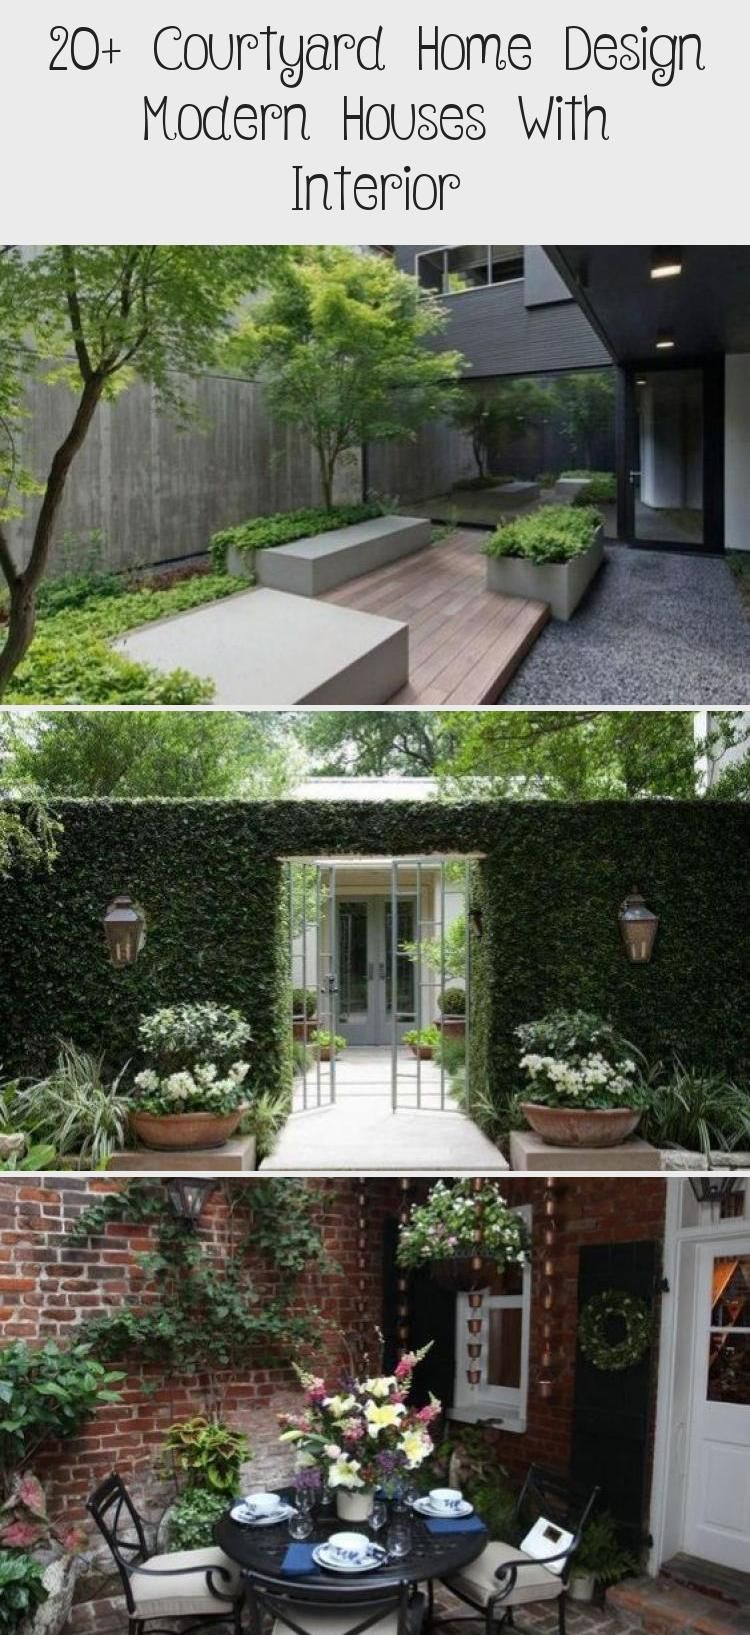 En Blog En Blog In 2020 Courtyard House Rustic Home Design Courtyard House Plans